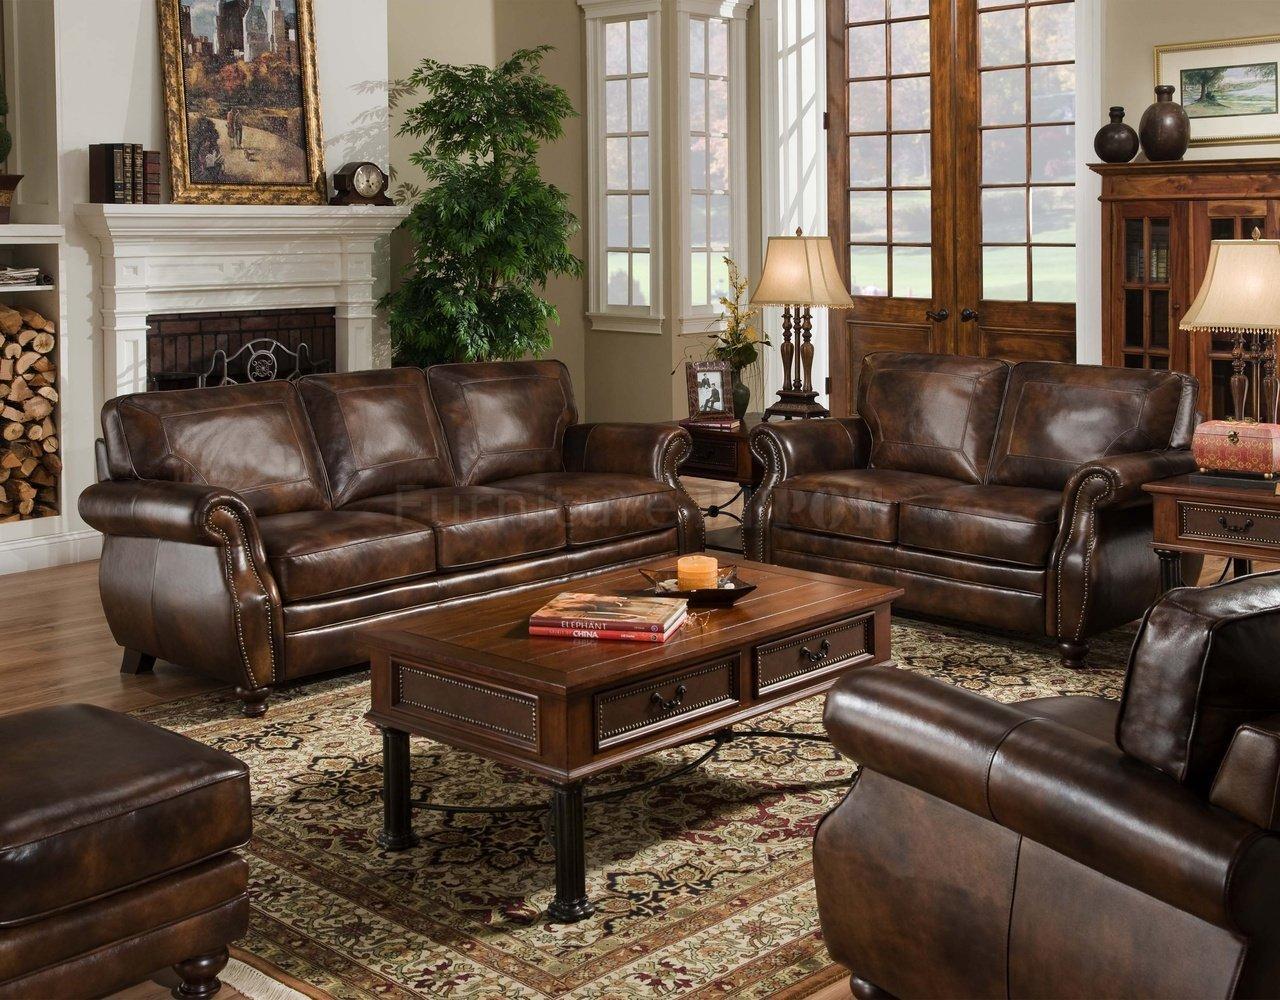 Doro portofino traditional leather loveseat with nail head trim bigfurniturewebsite love seat